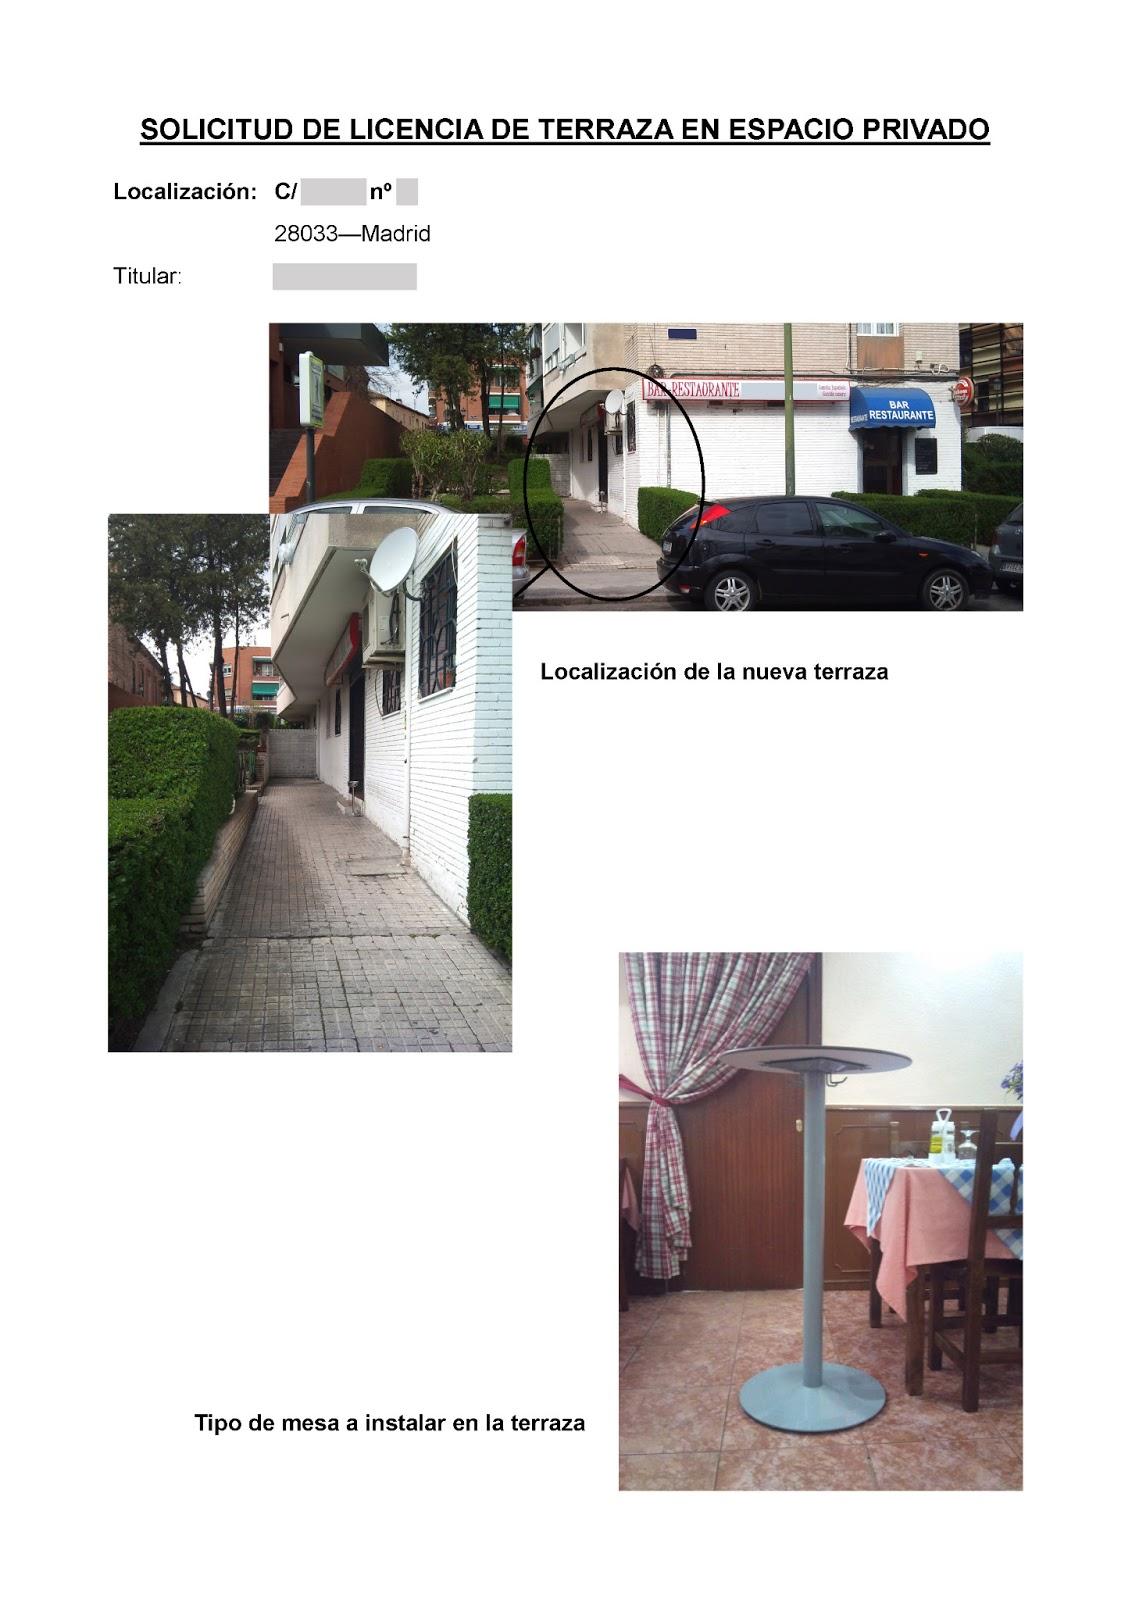 Lrh proyectos terraza para bar en suelo privado - Suelos para bares ...